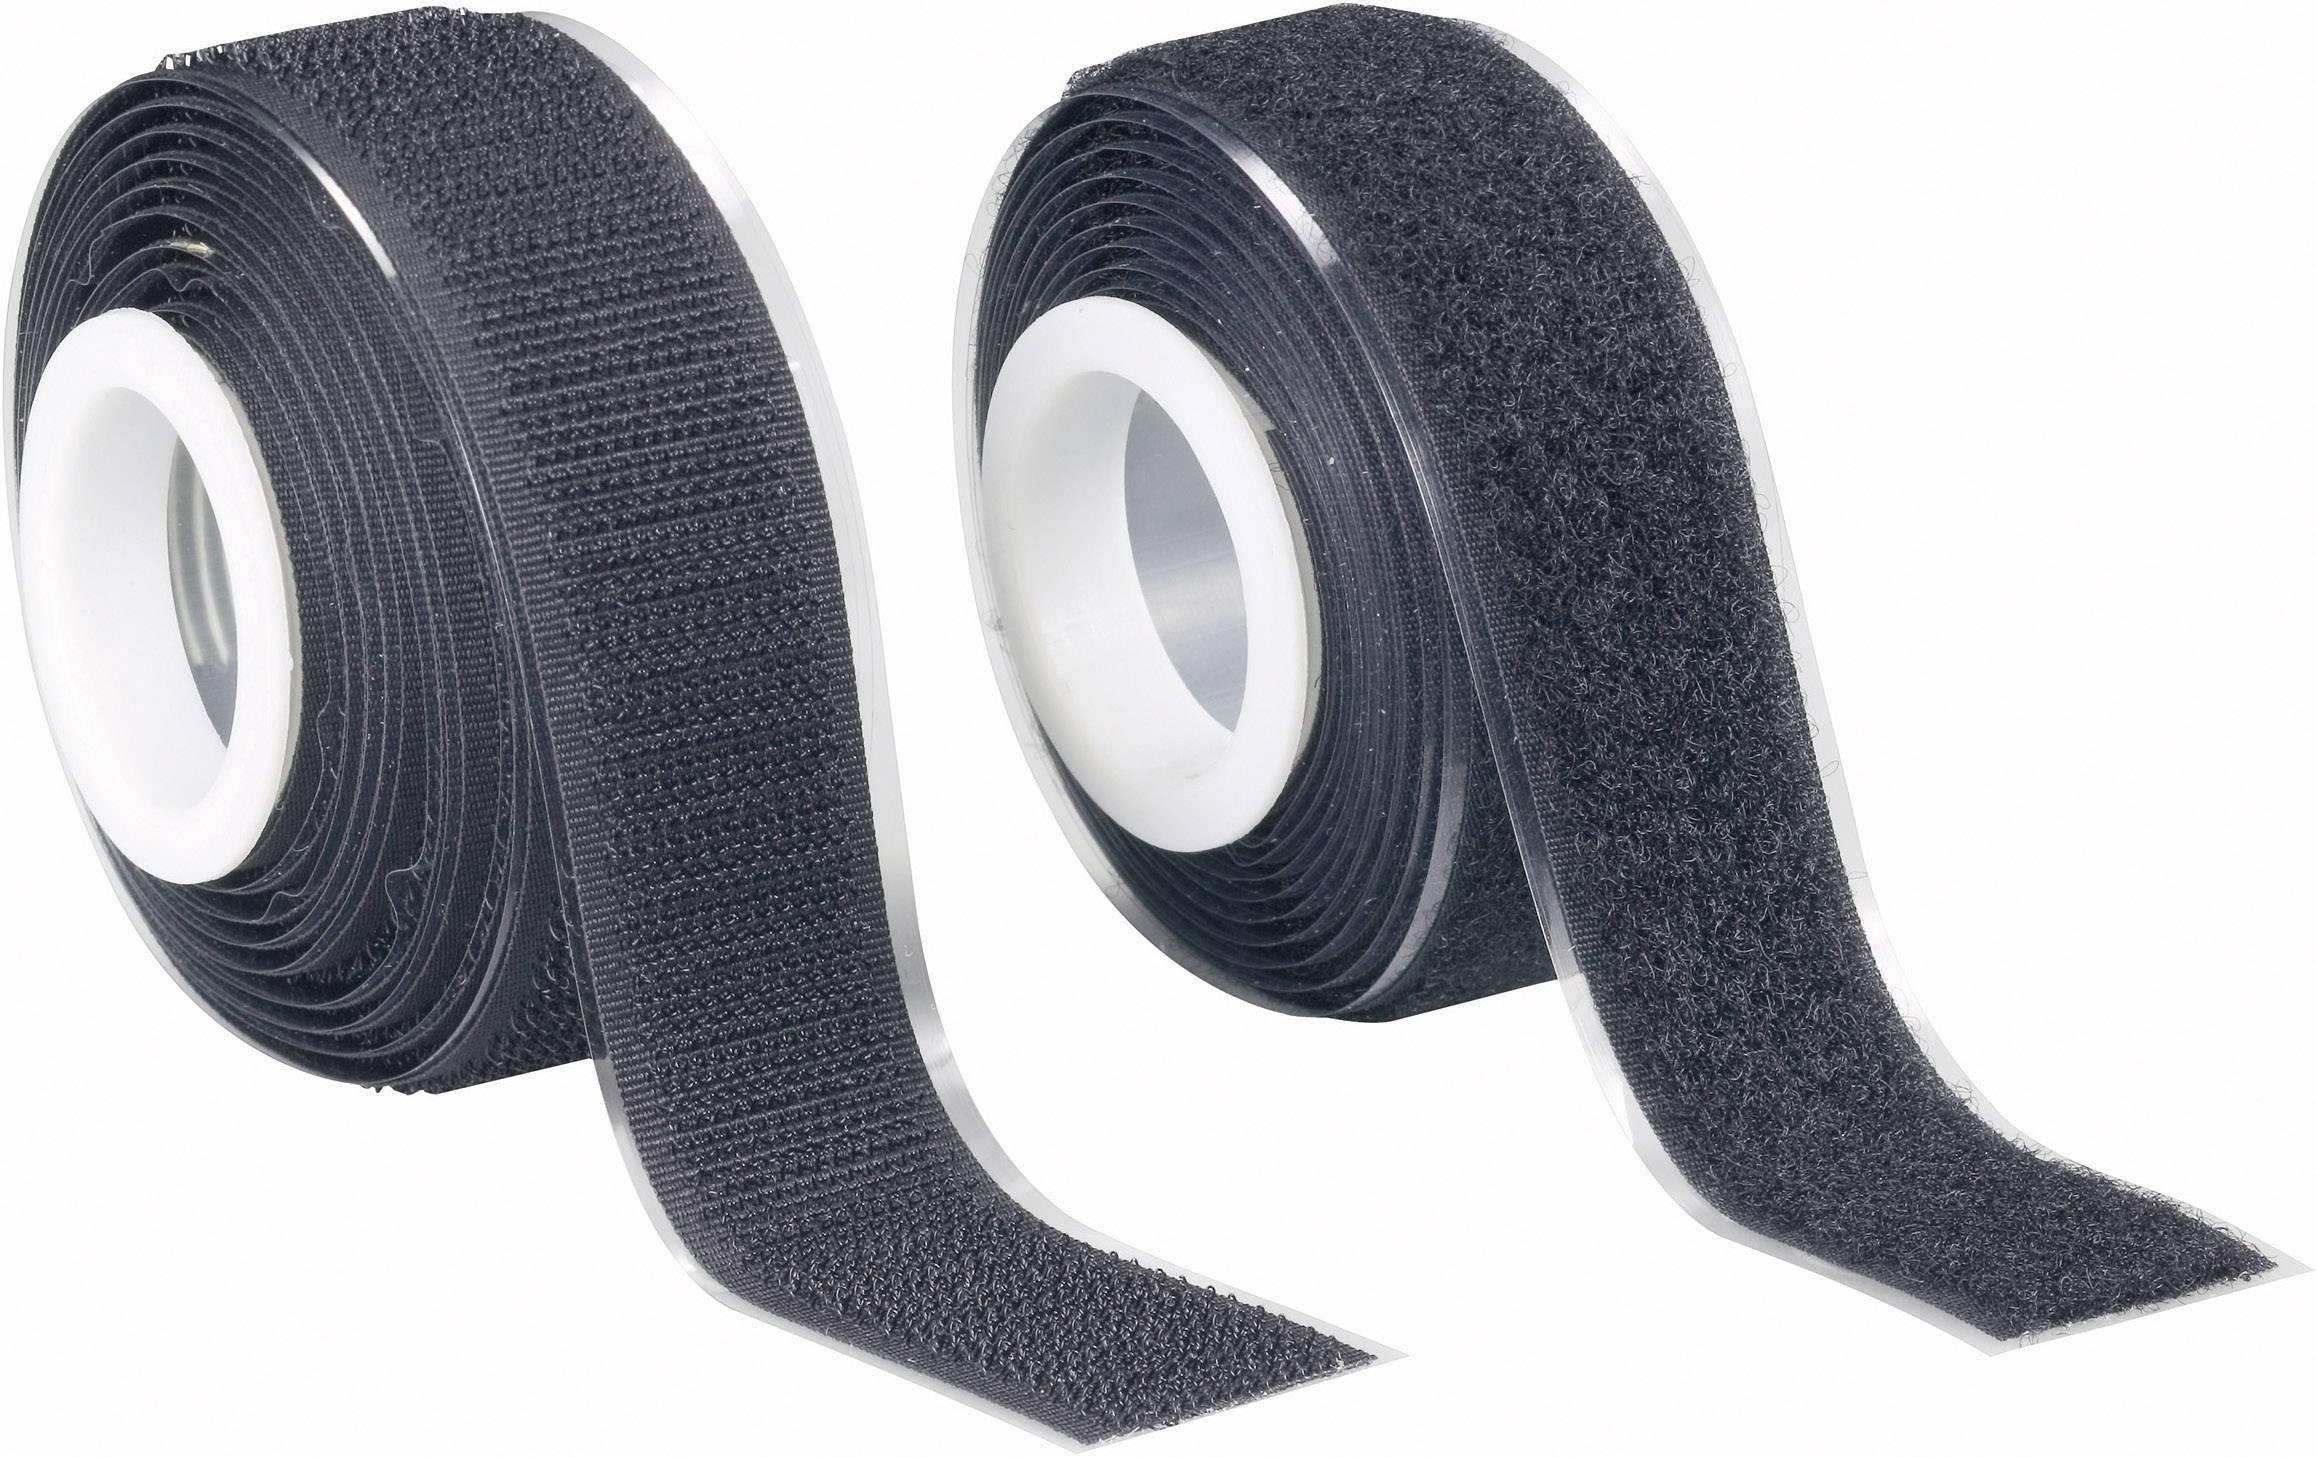 Lepiaci pásik so suchým zipsom Fastech (d x š) 2000 mm x 25 mm, čierna, 1 pár